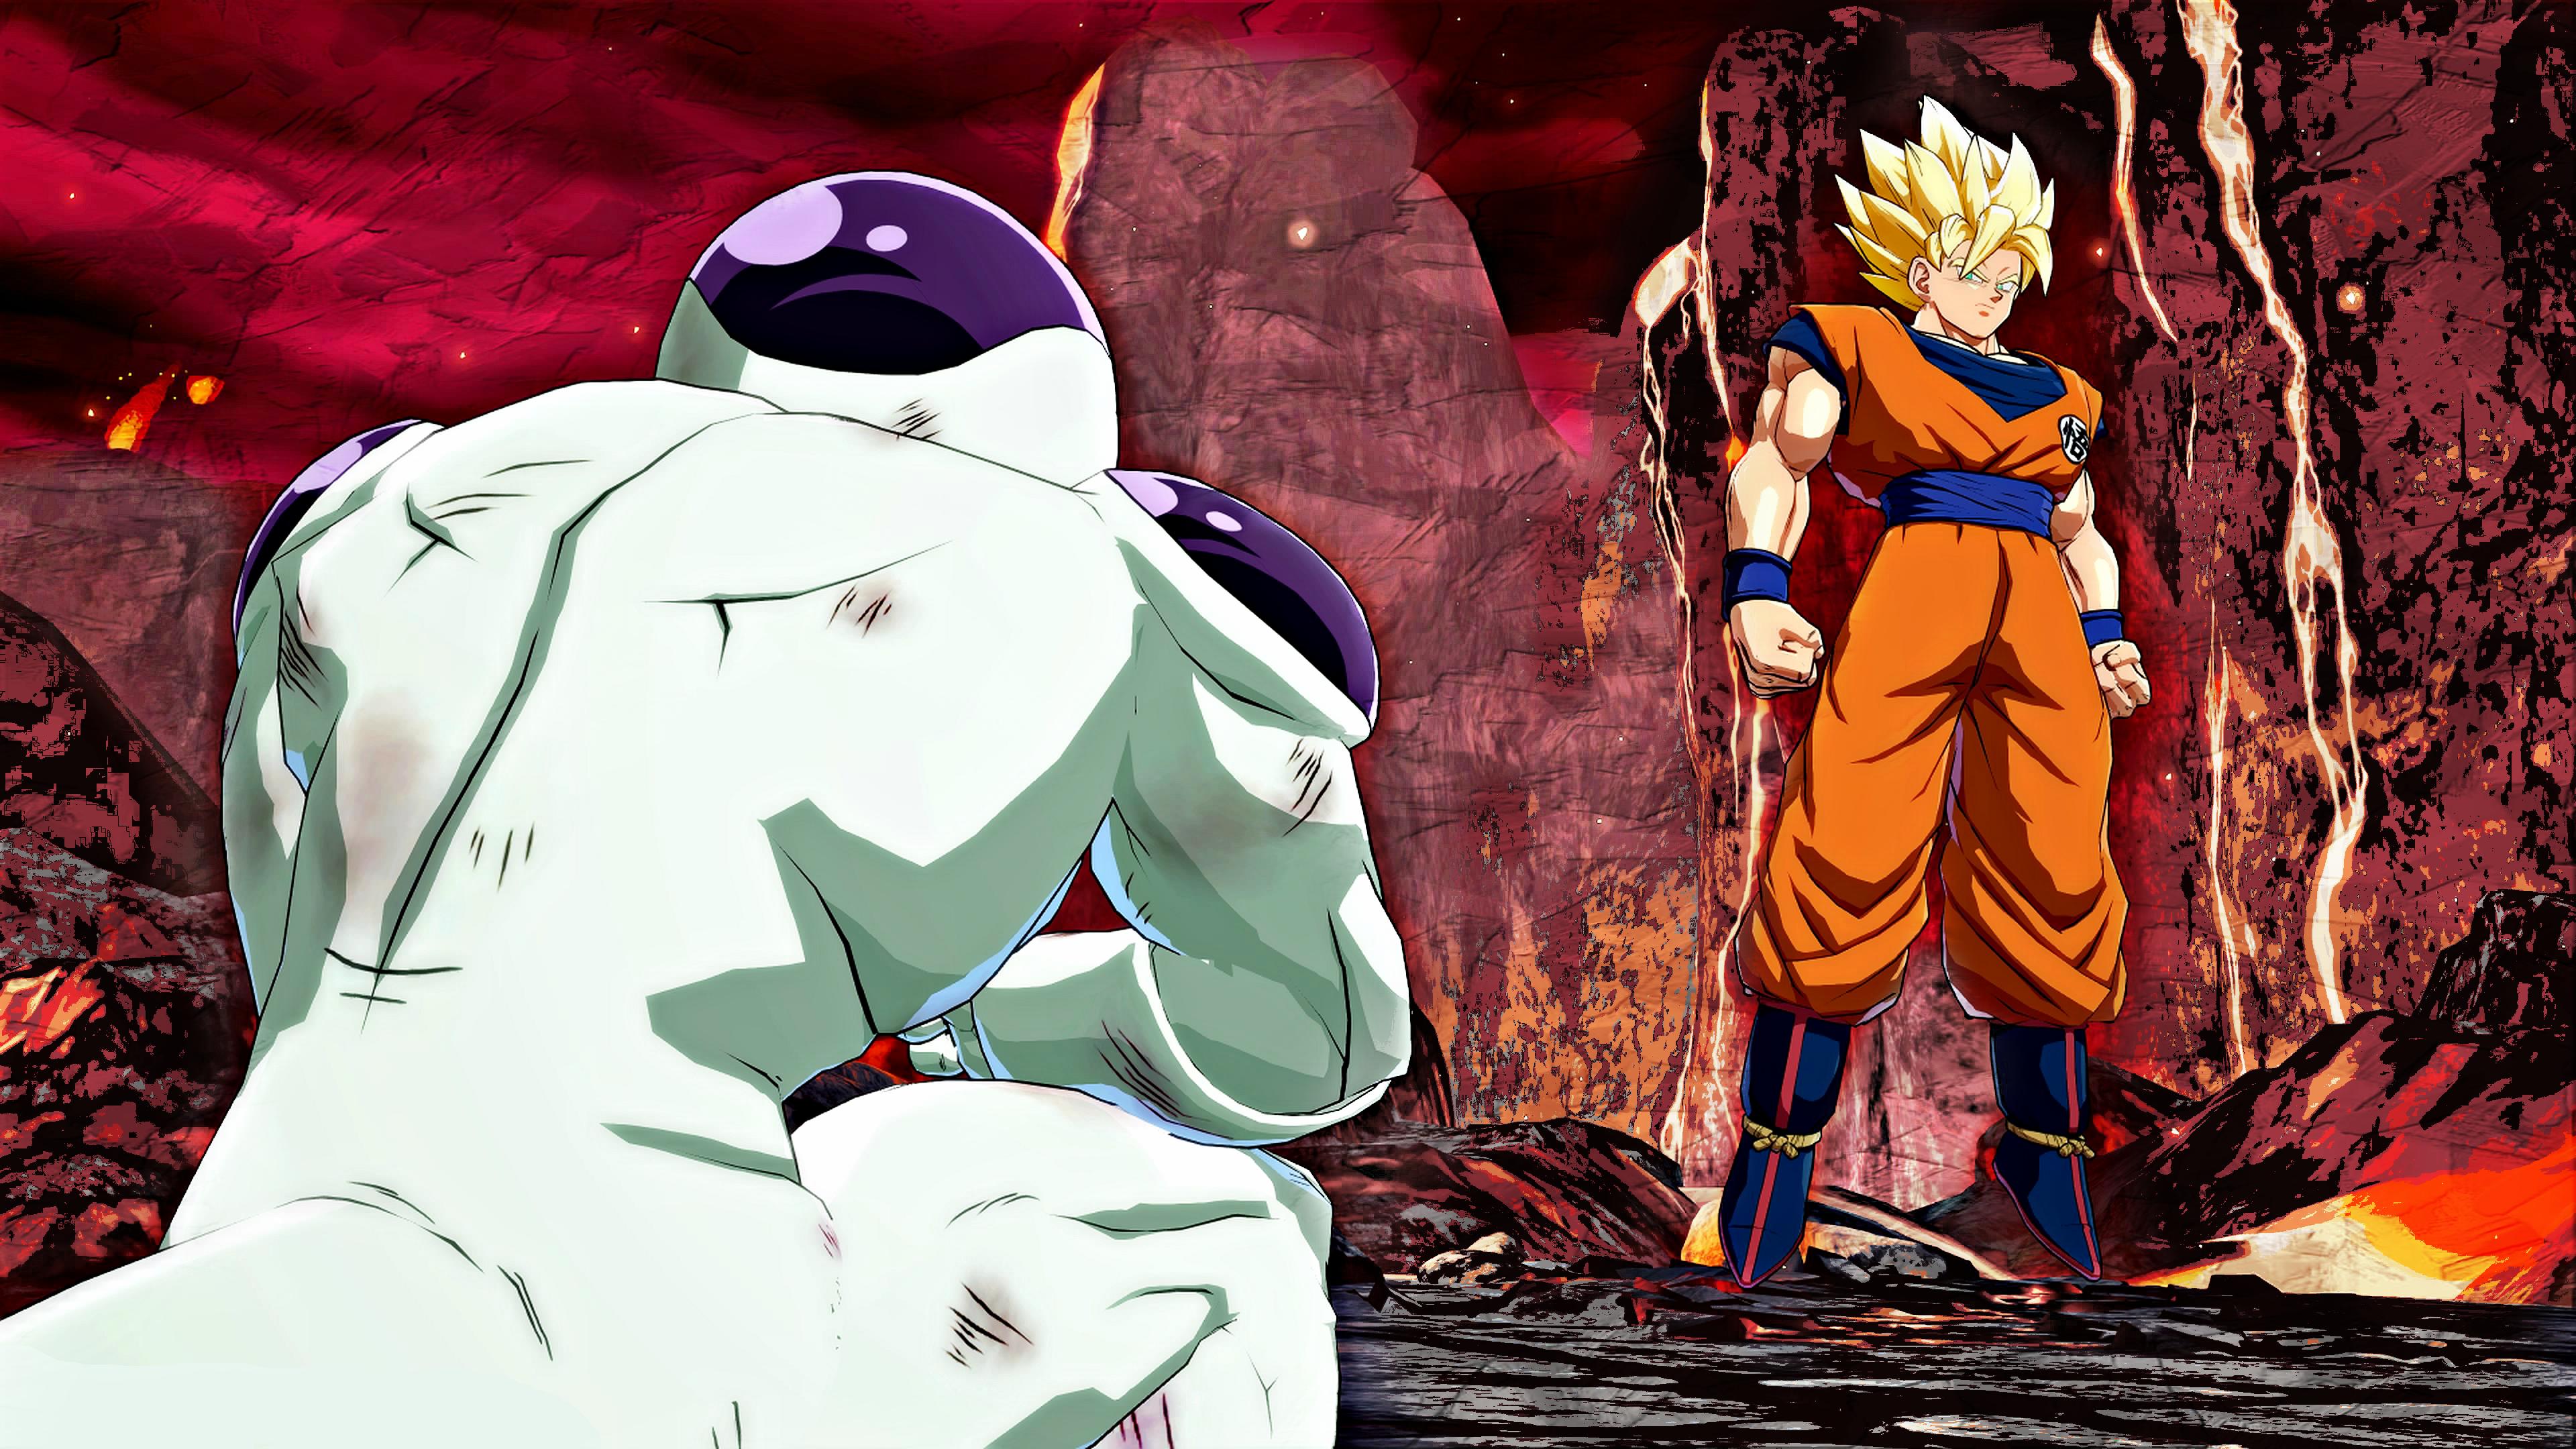 Memes FanartFrieza VS Goku 4K Wallpaper